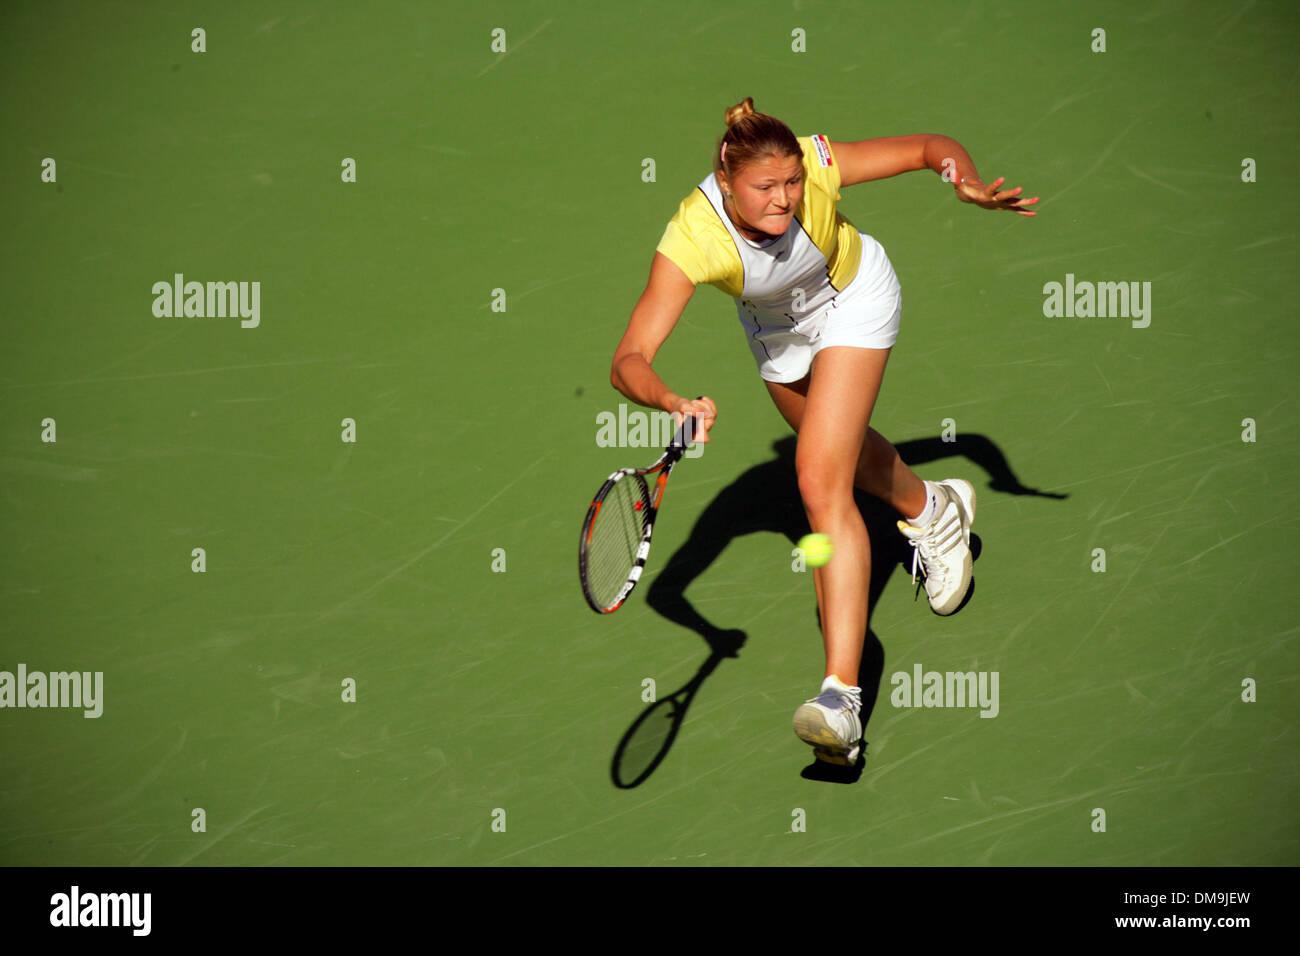 Mar 12, 2005; Indian Wells, California, USA; MARIA SHARAPOVA  at the Pacific Life Open Tennis tournament 2003. Stock Photo